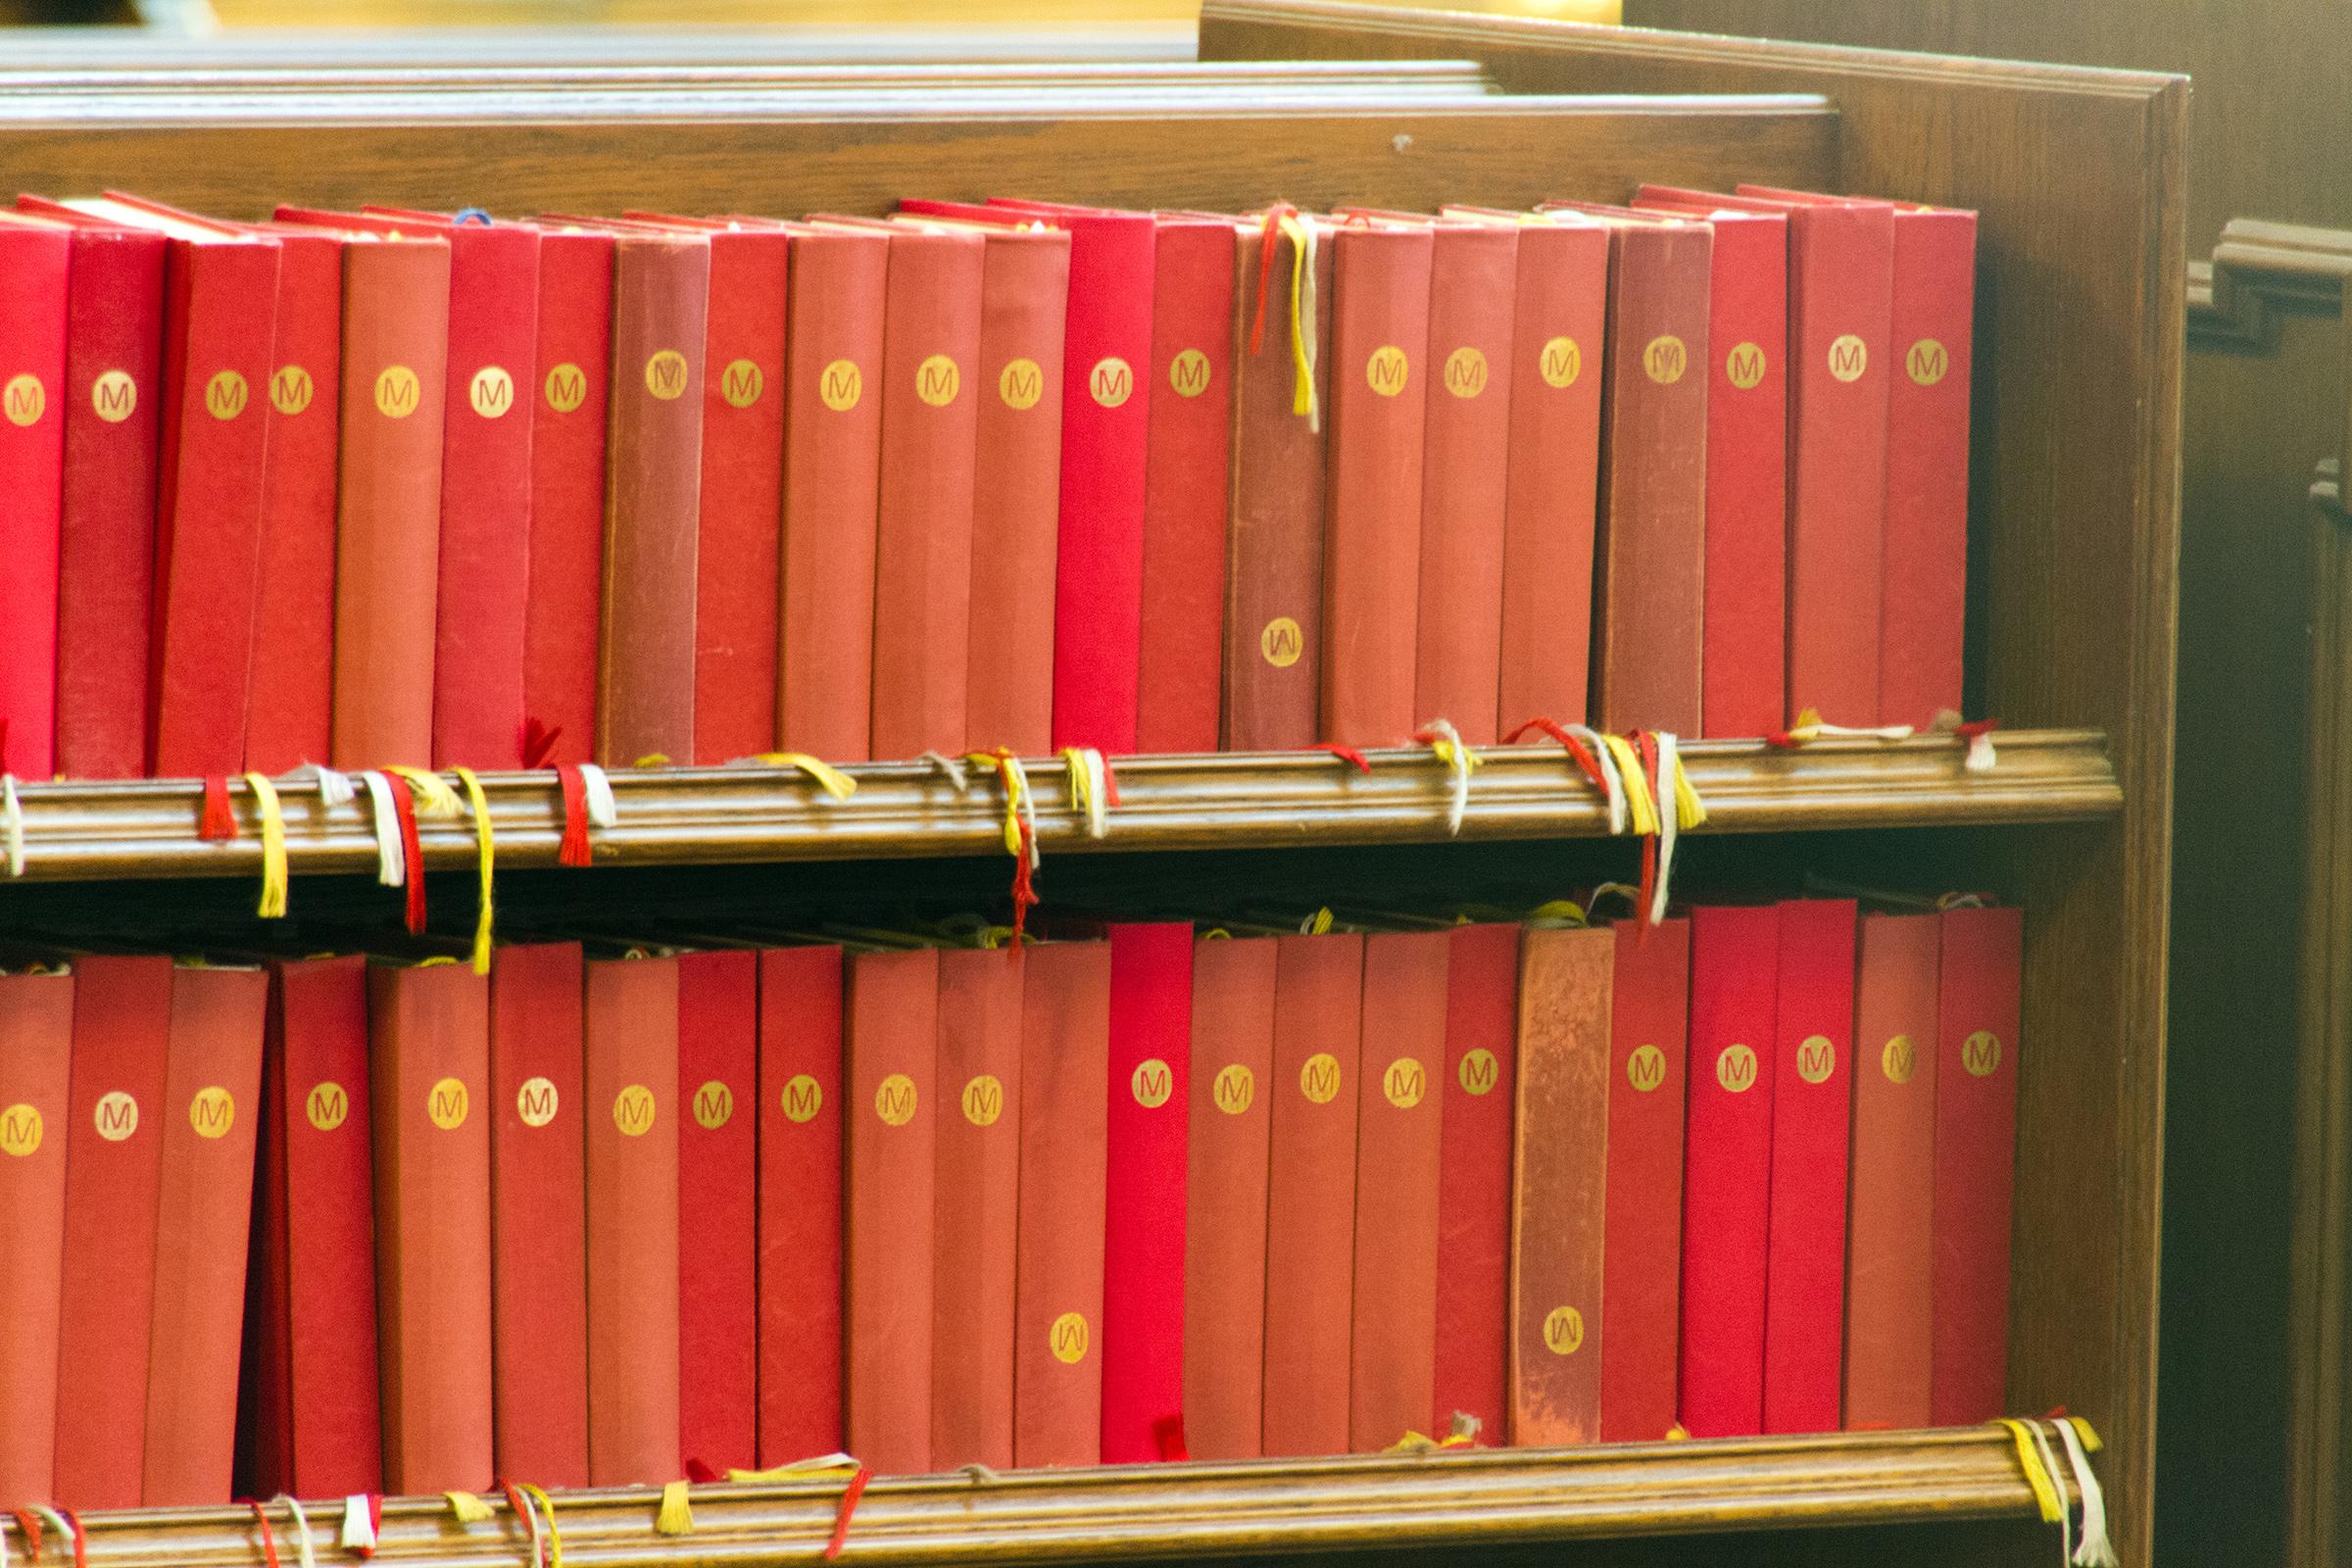 Books, Paper, Paperback, Publication, Old, HQ Photo